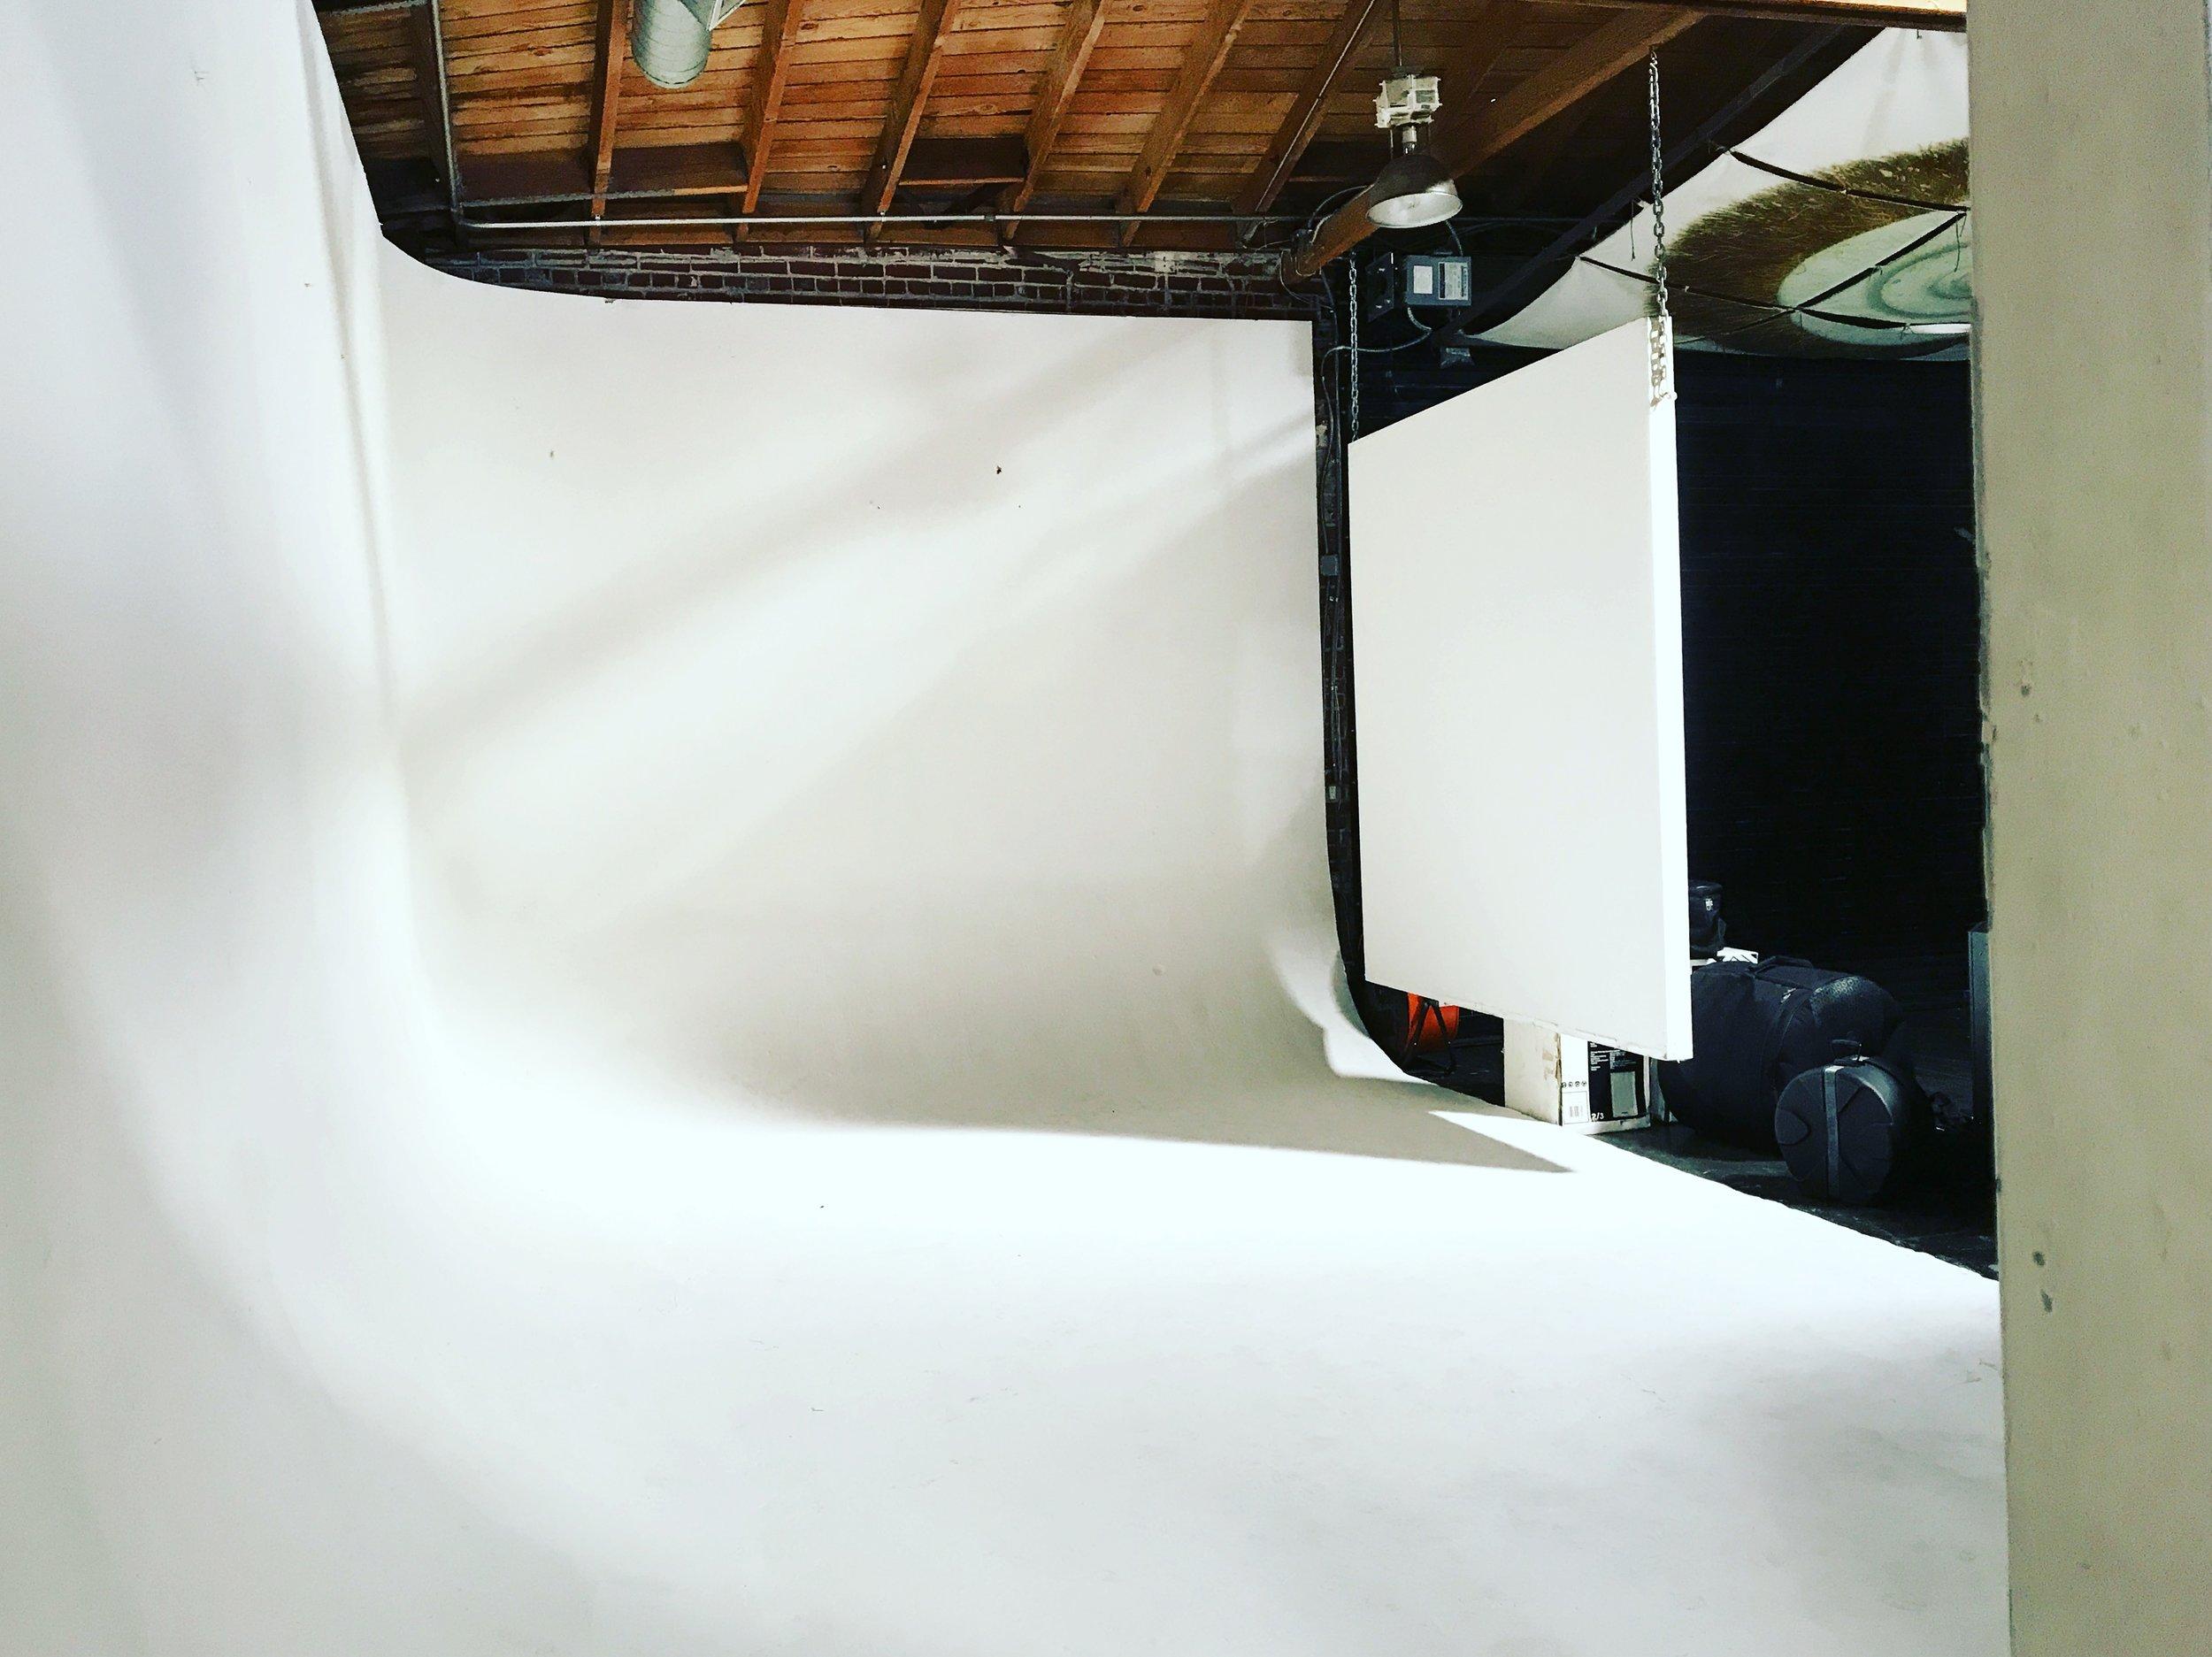 box8 2019 cyc wall.JPG